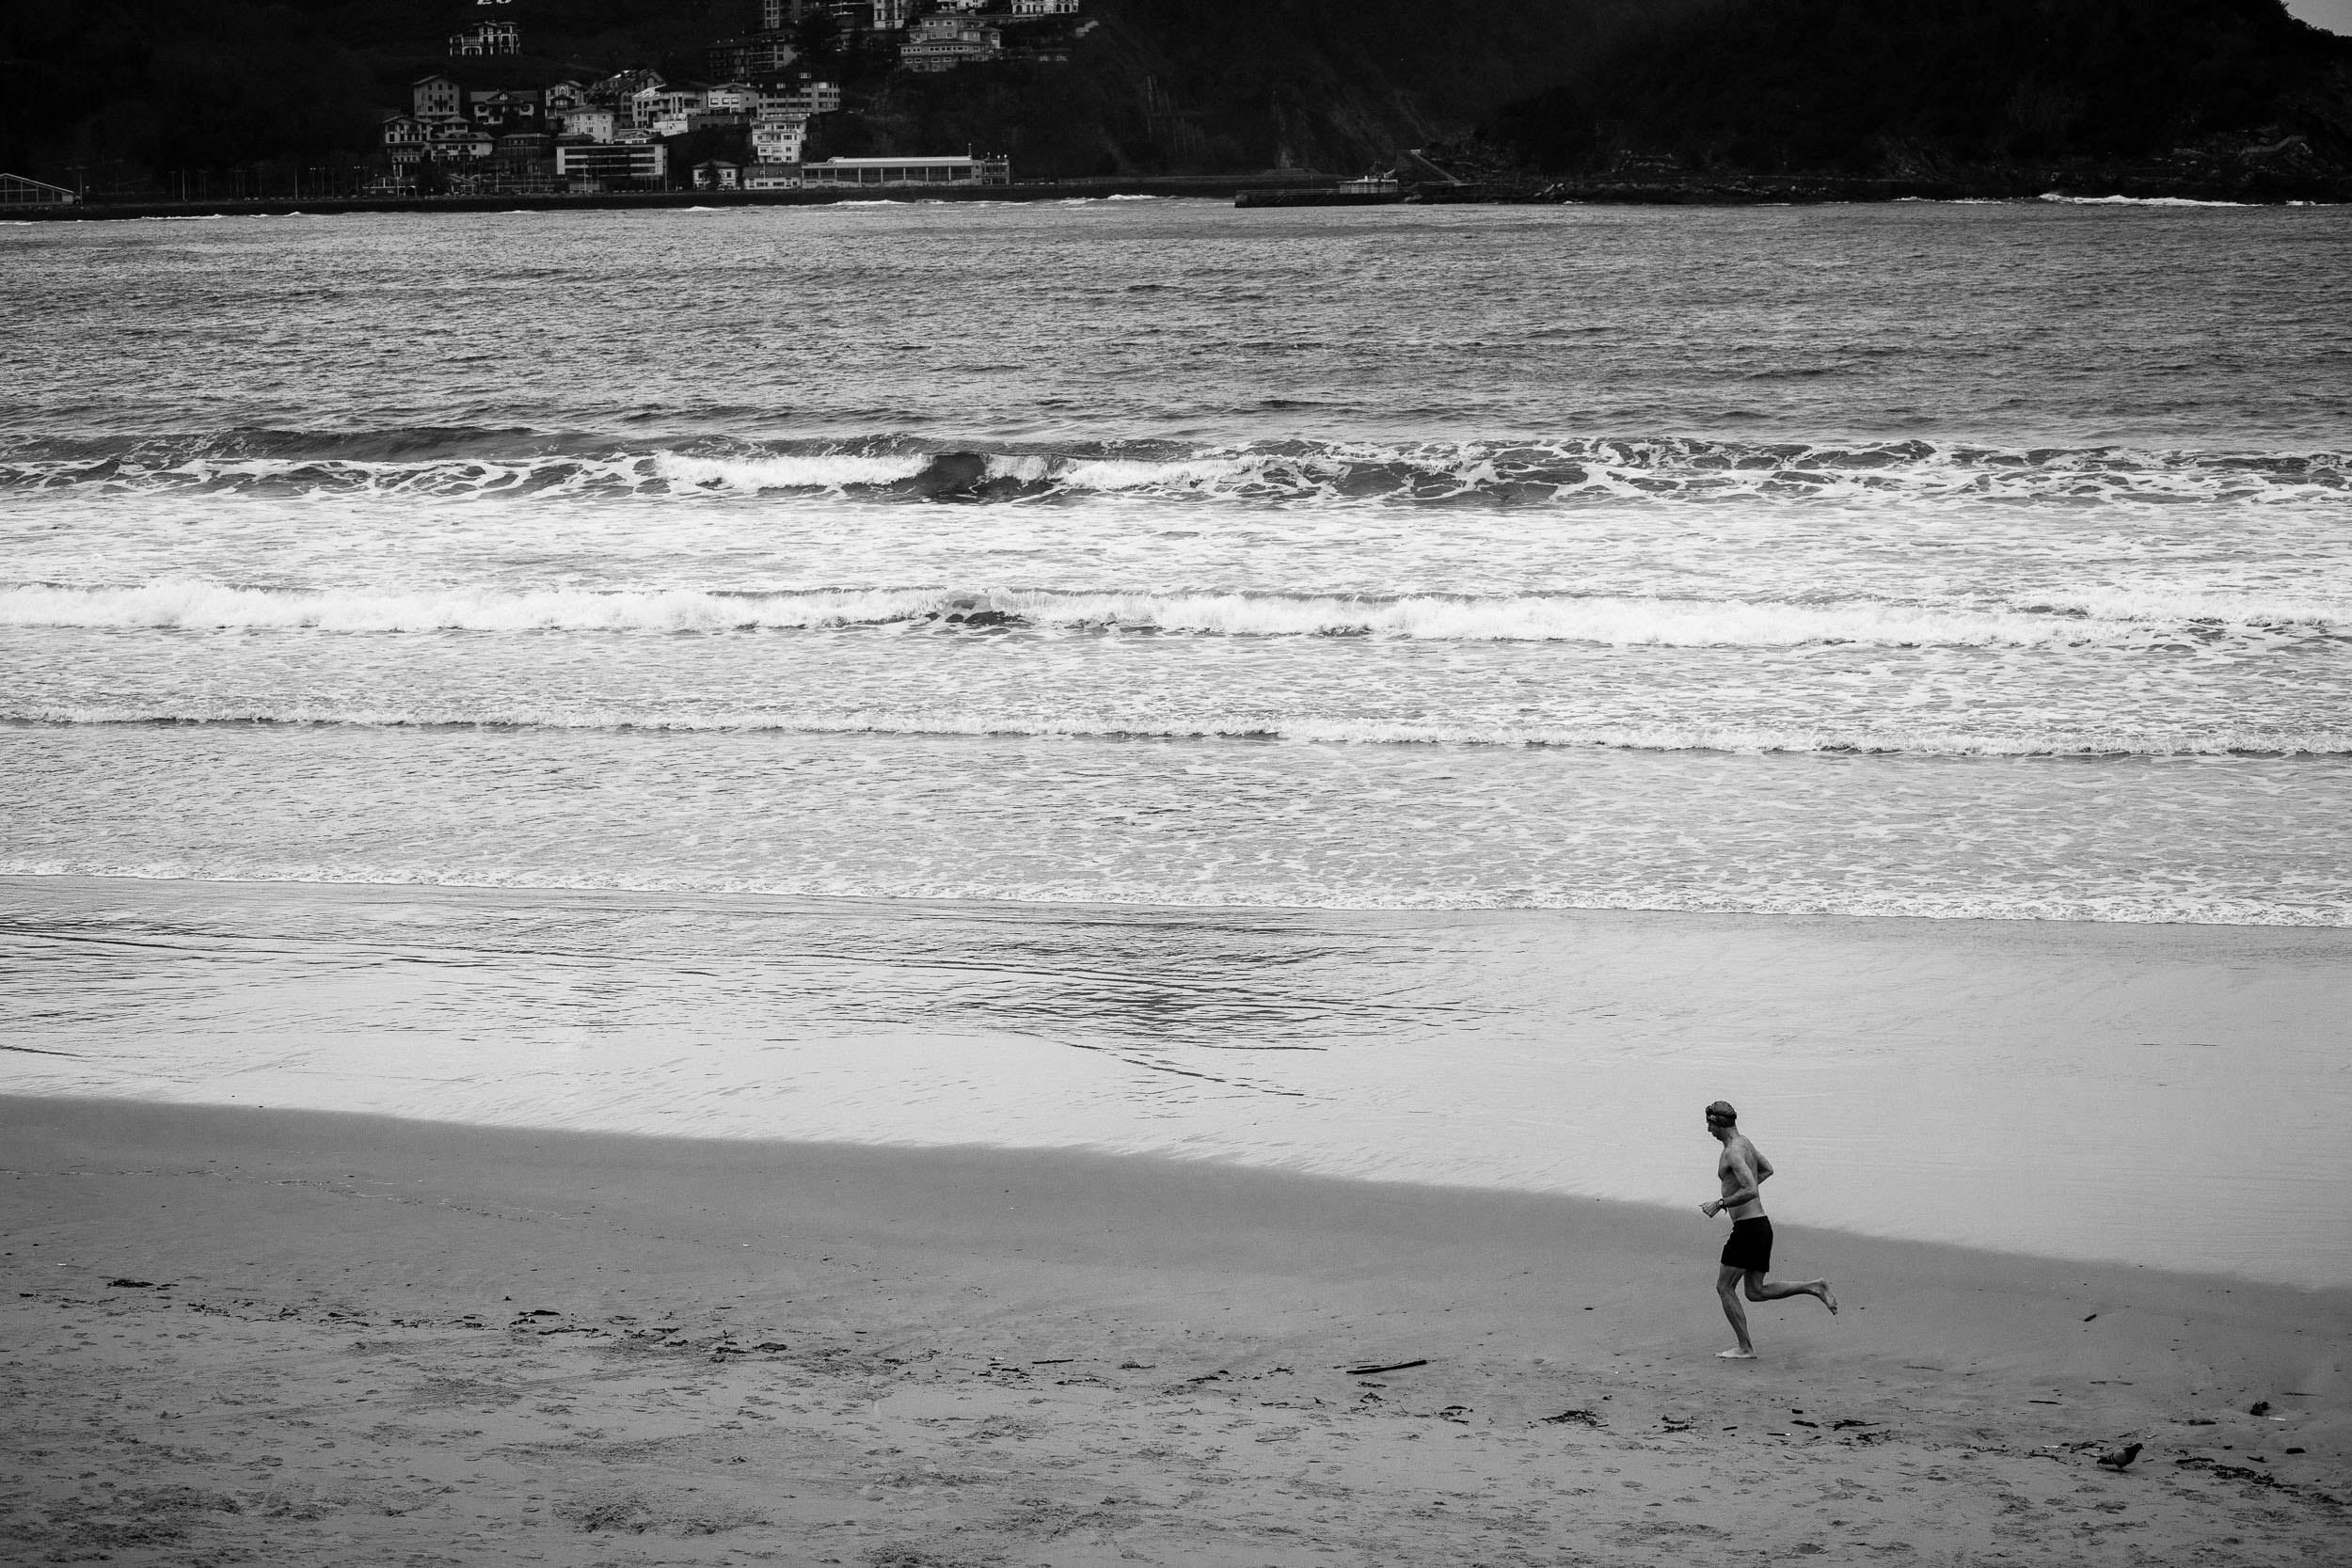 Wedding Photography in San Sebastian | Spring Photos on La Concha Beach San Sebastian Gipuzkoa Basque Country Spain - James Sturcke  Photographer | sturcke.org_003.jpg